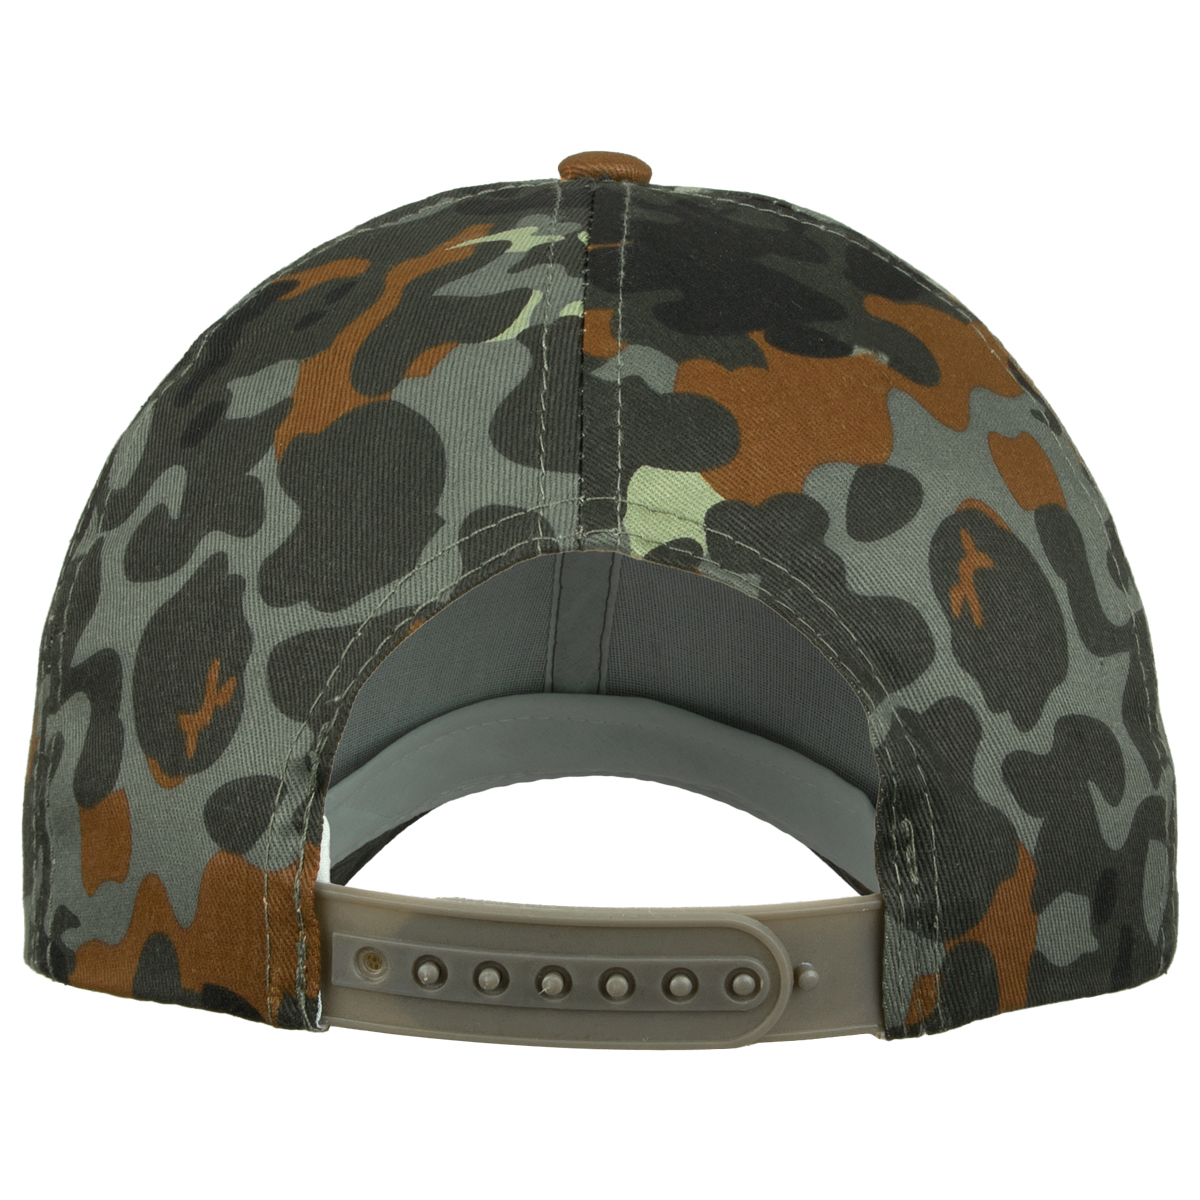 Moktasp 2019 Camouflage Star Fruits Kids Snapback Camo Chlidren Basketball Cap Hip hop Cap Kermit Boys Girls Hats